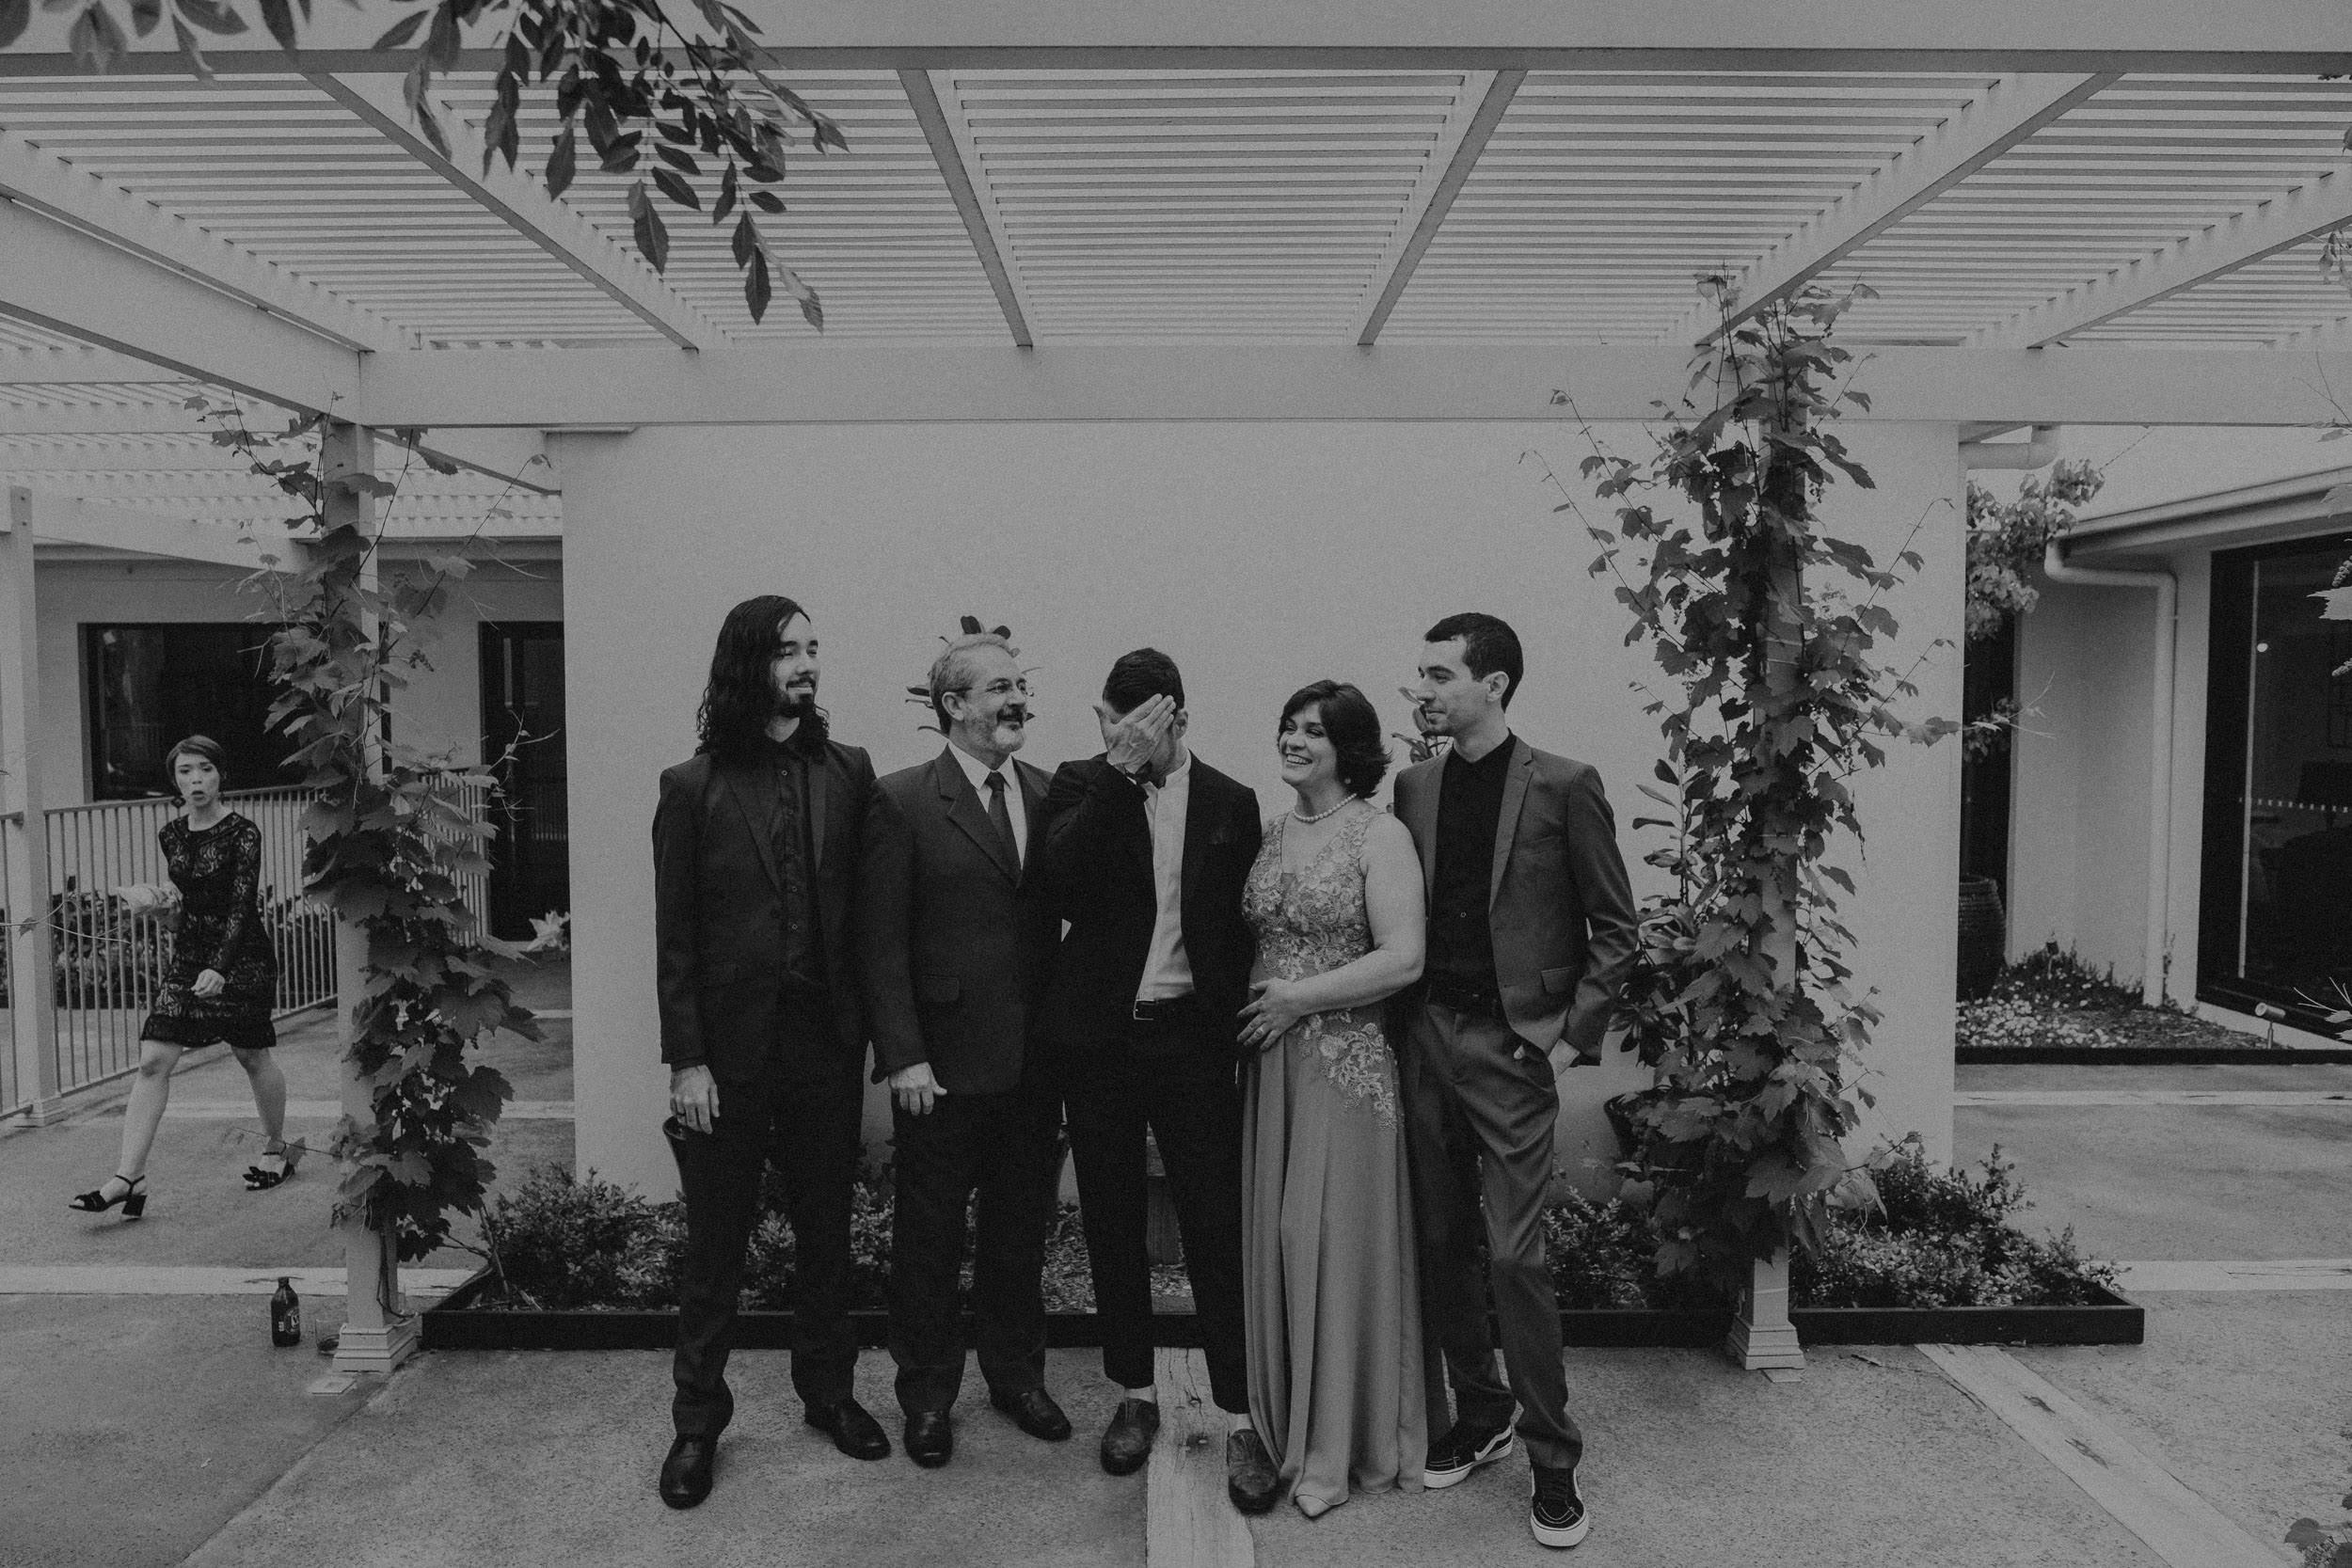 s+j_top_elopement wedding photography_kings & thieves_blog - 135.jpg